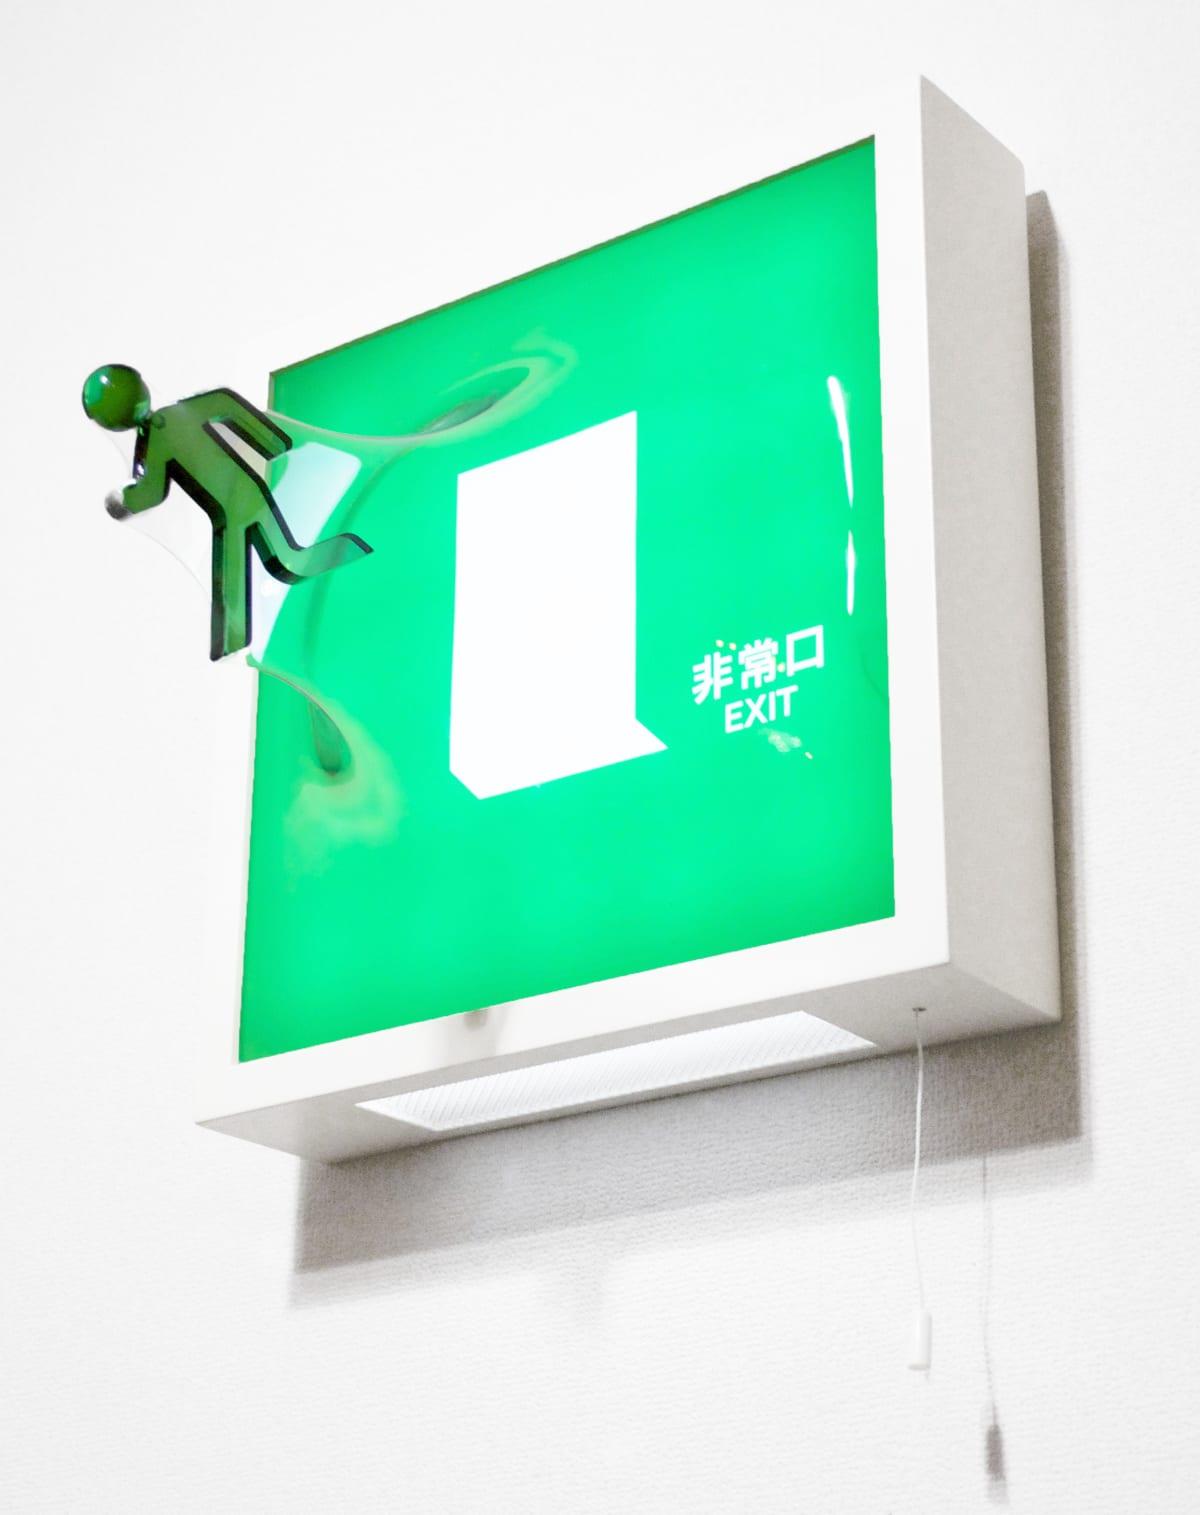 Yuki Matsueda, This is EXIT (Square 300 green), 2018